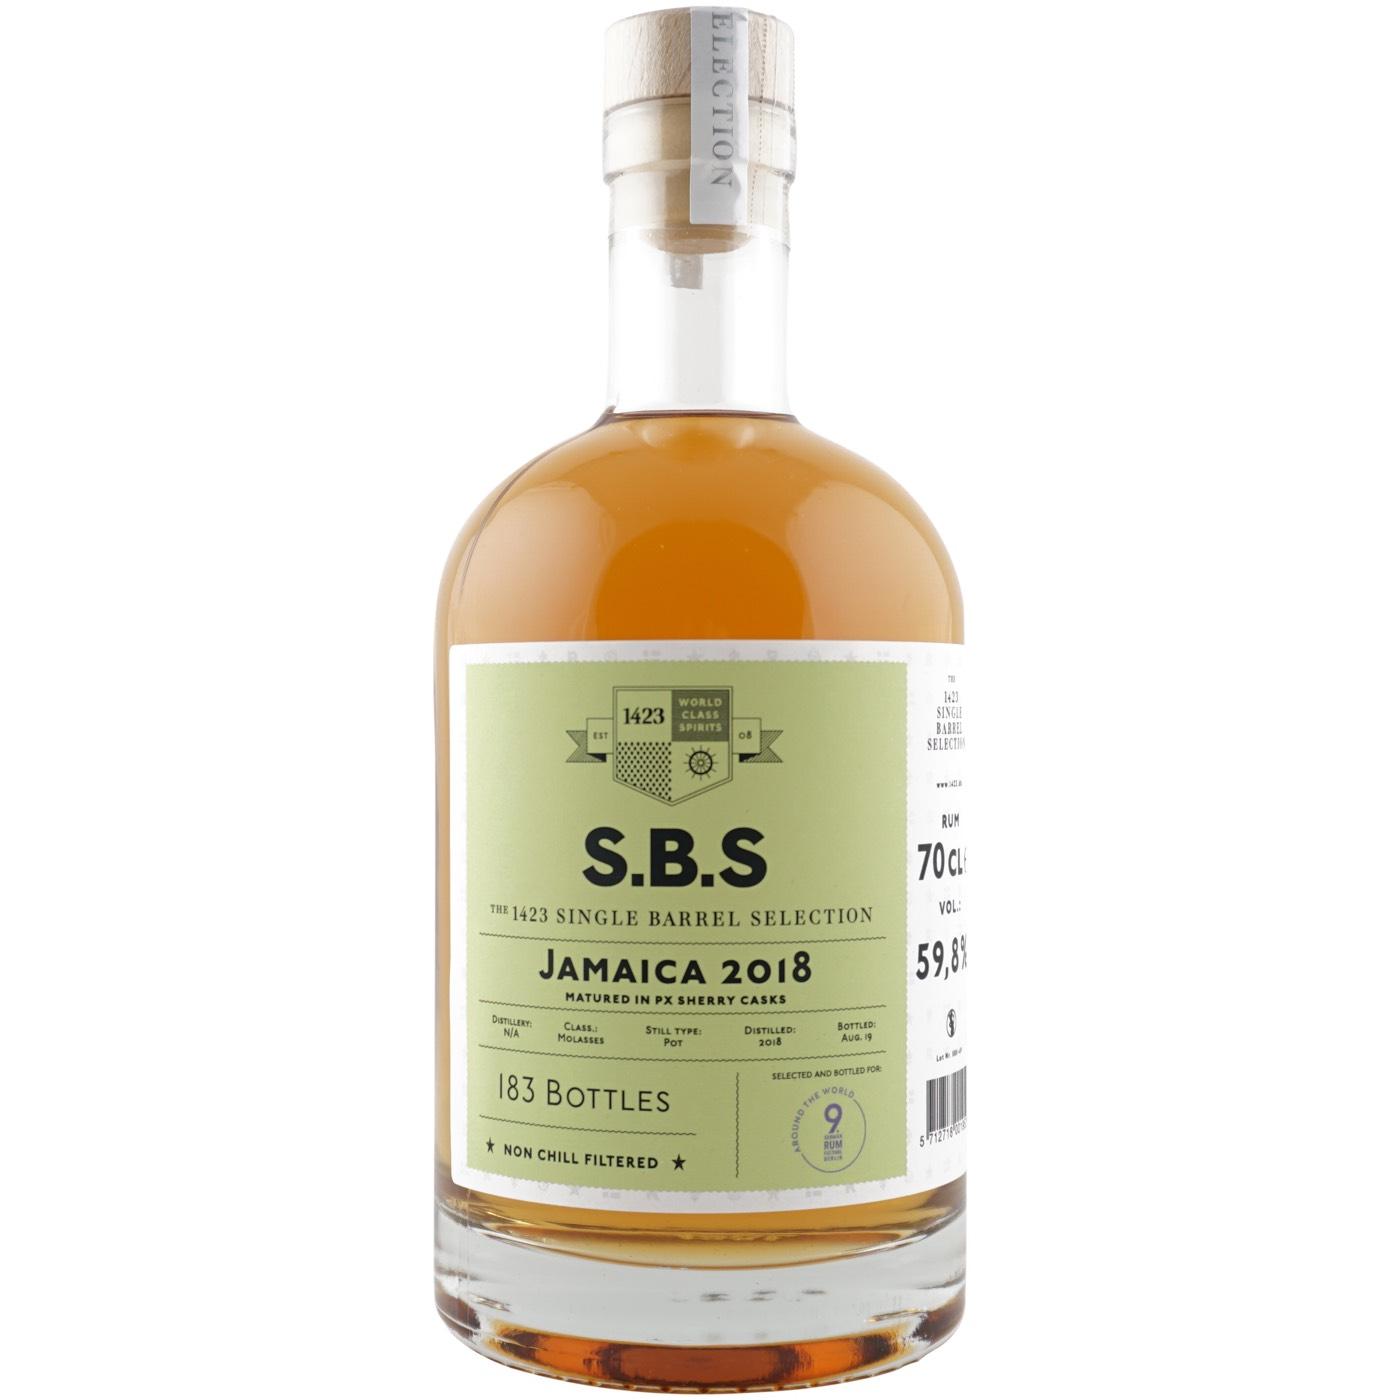 Bottle image of S.B.S Jamaica (9. German Rum Festival) DOK